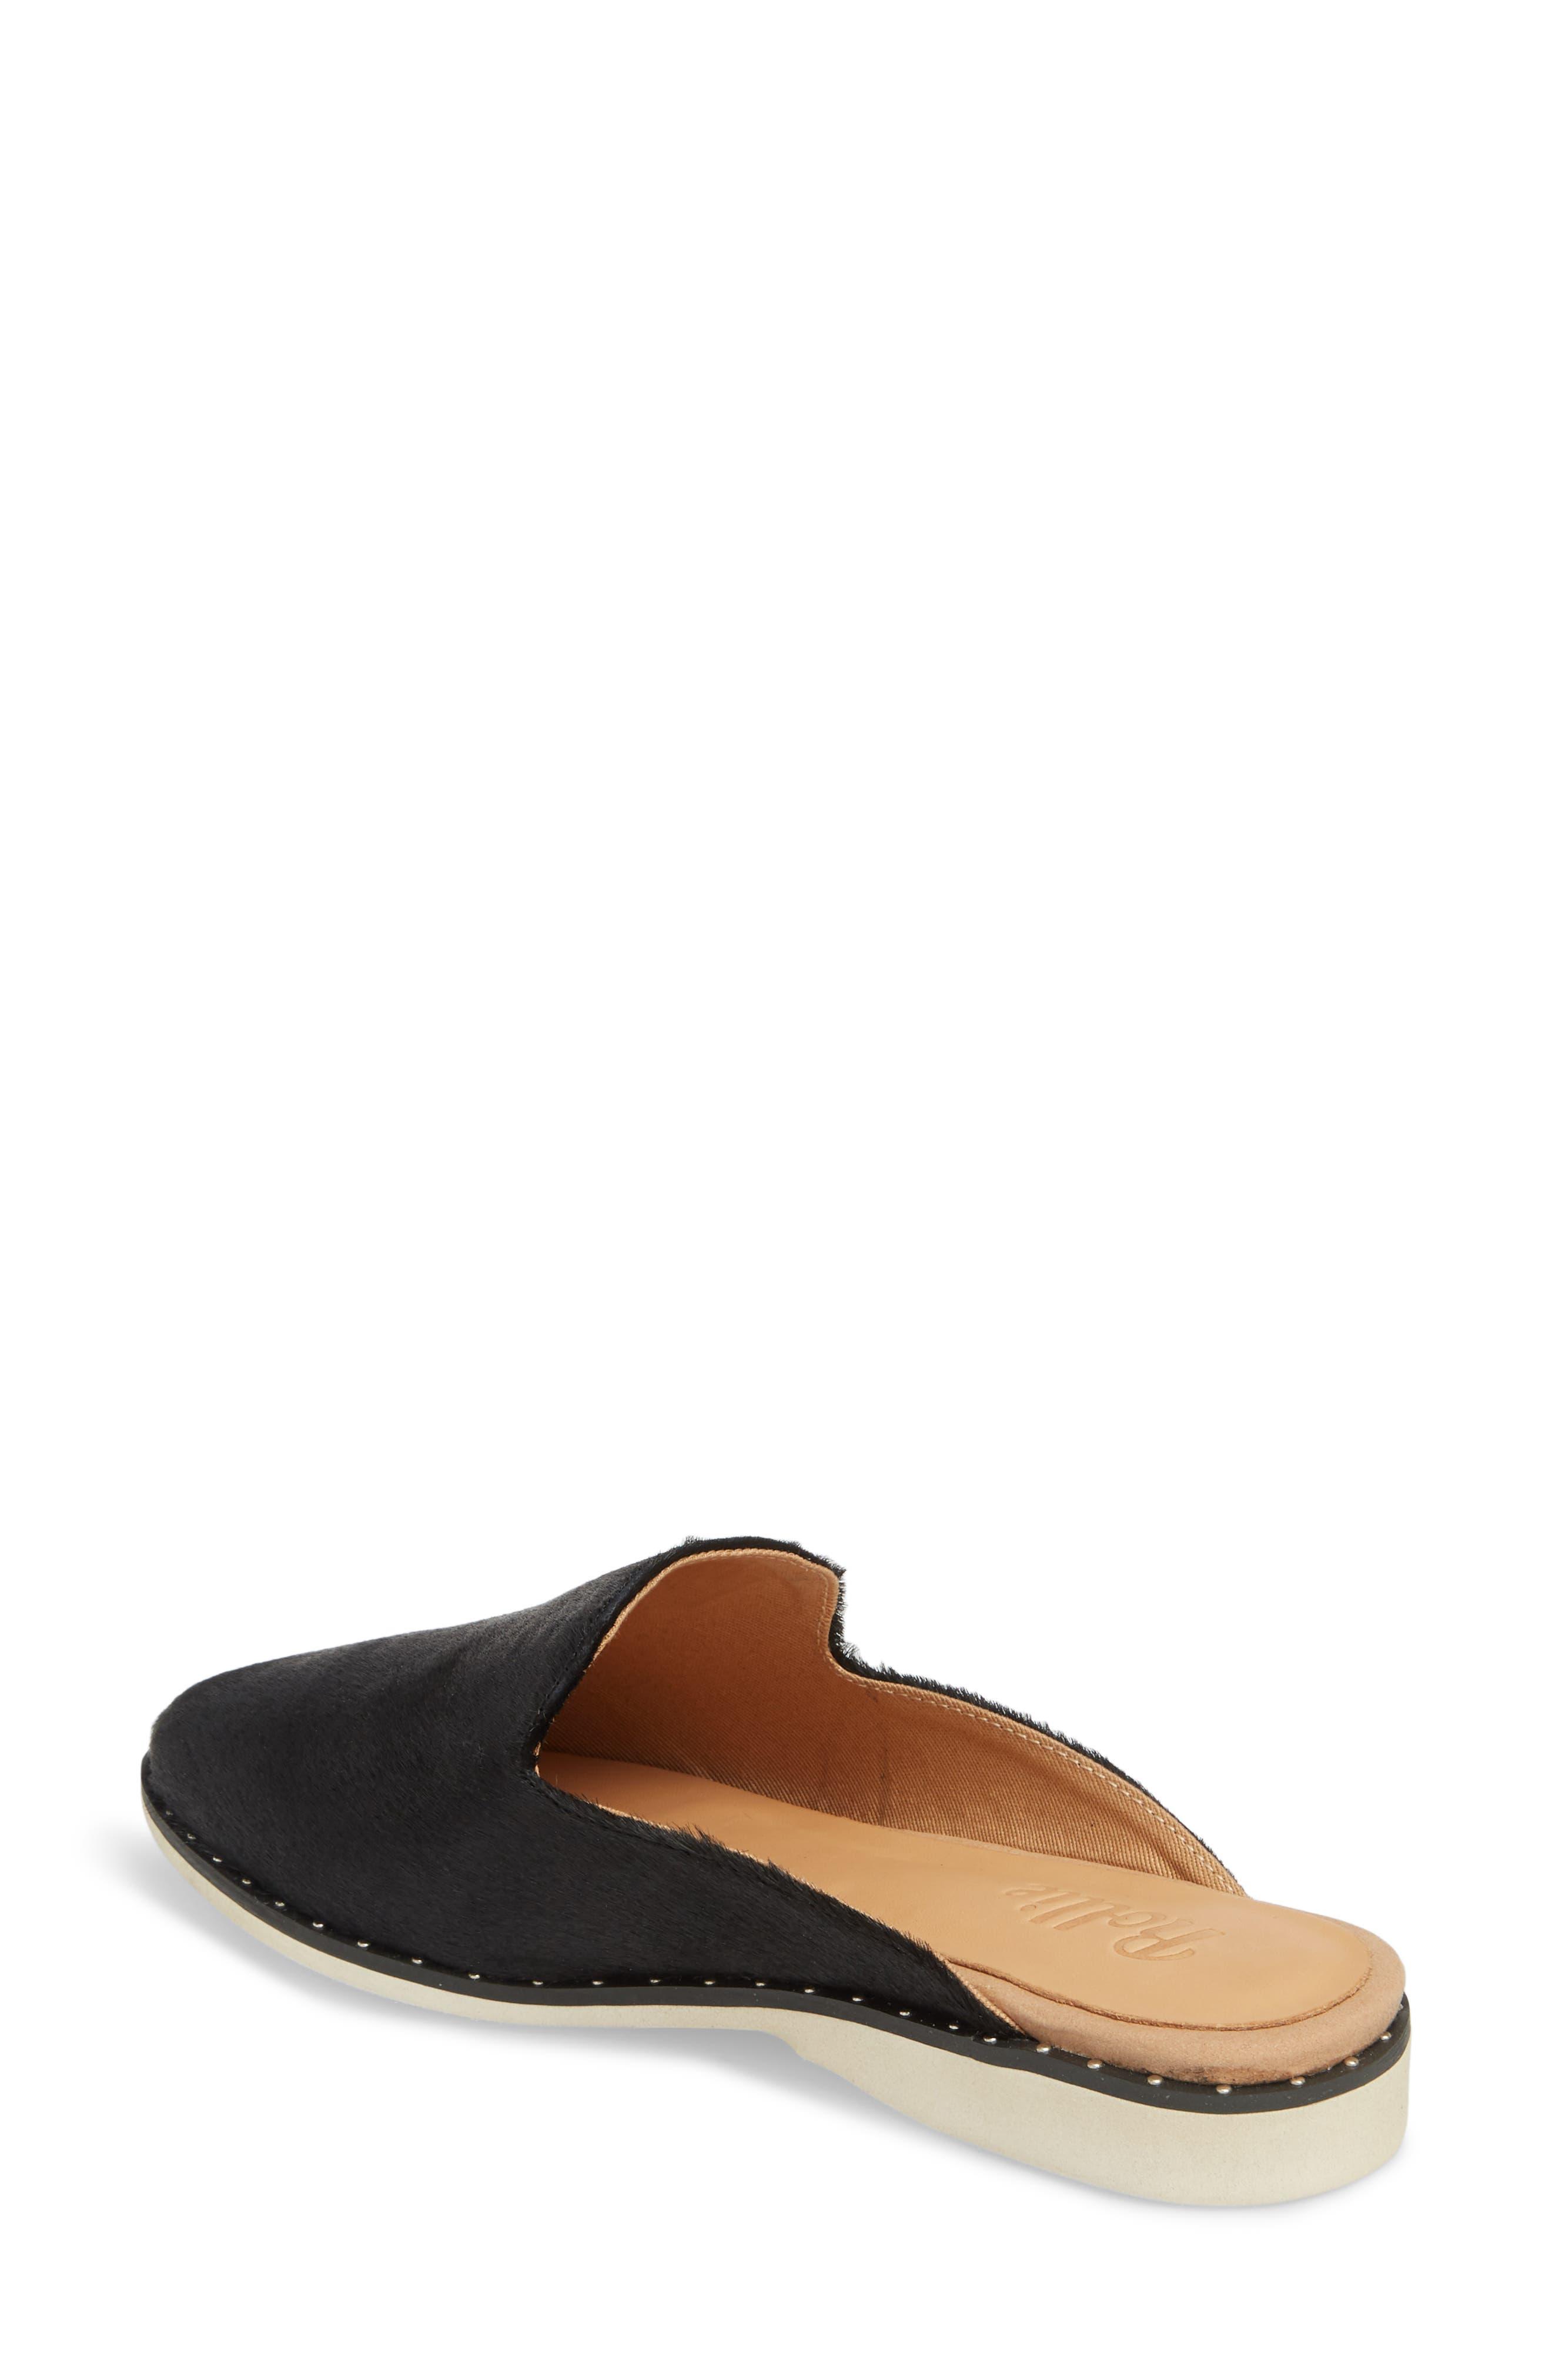 Madison Studded Genuine Calf Hair Loafer Mule,                             Alternate thumbnail 2, color,                             Black Calf Hair